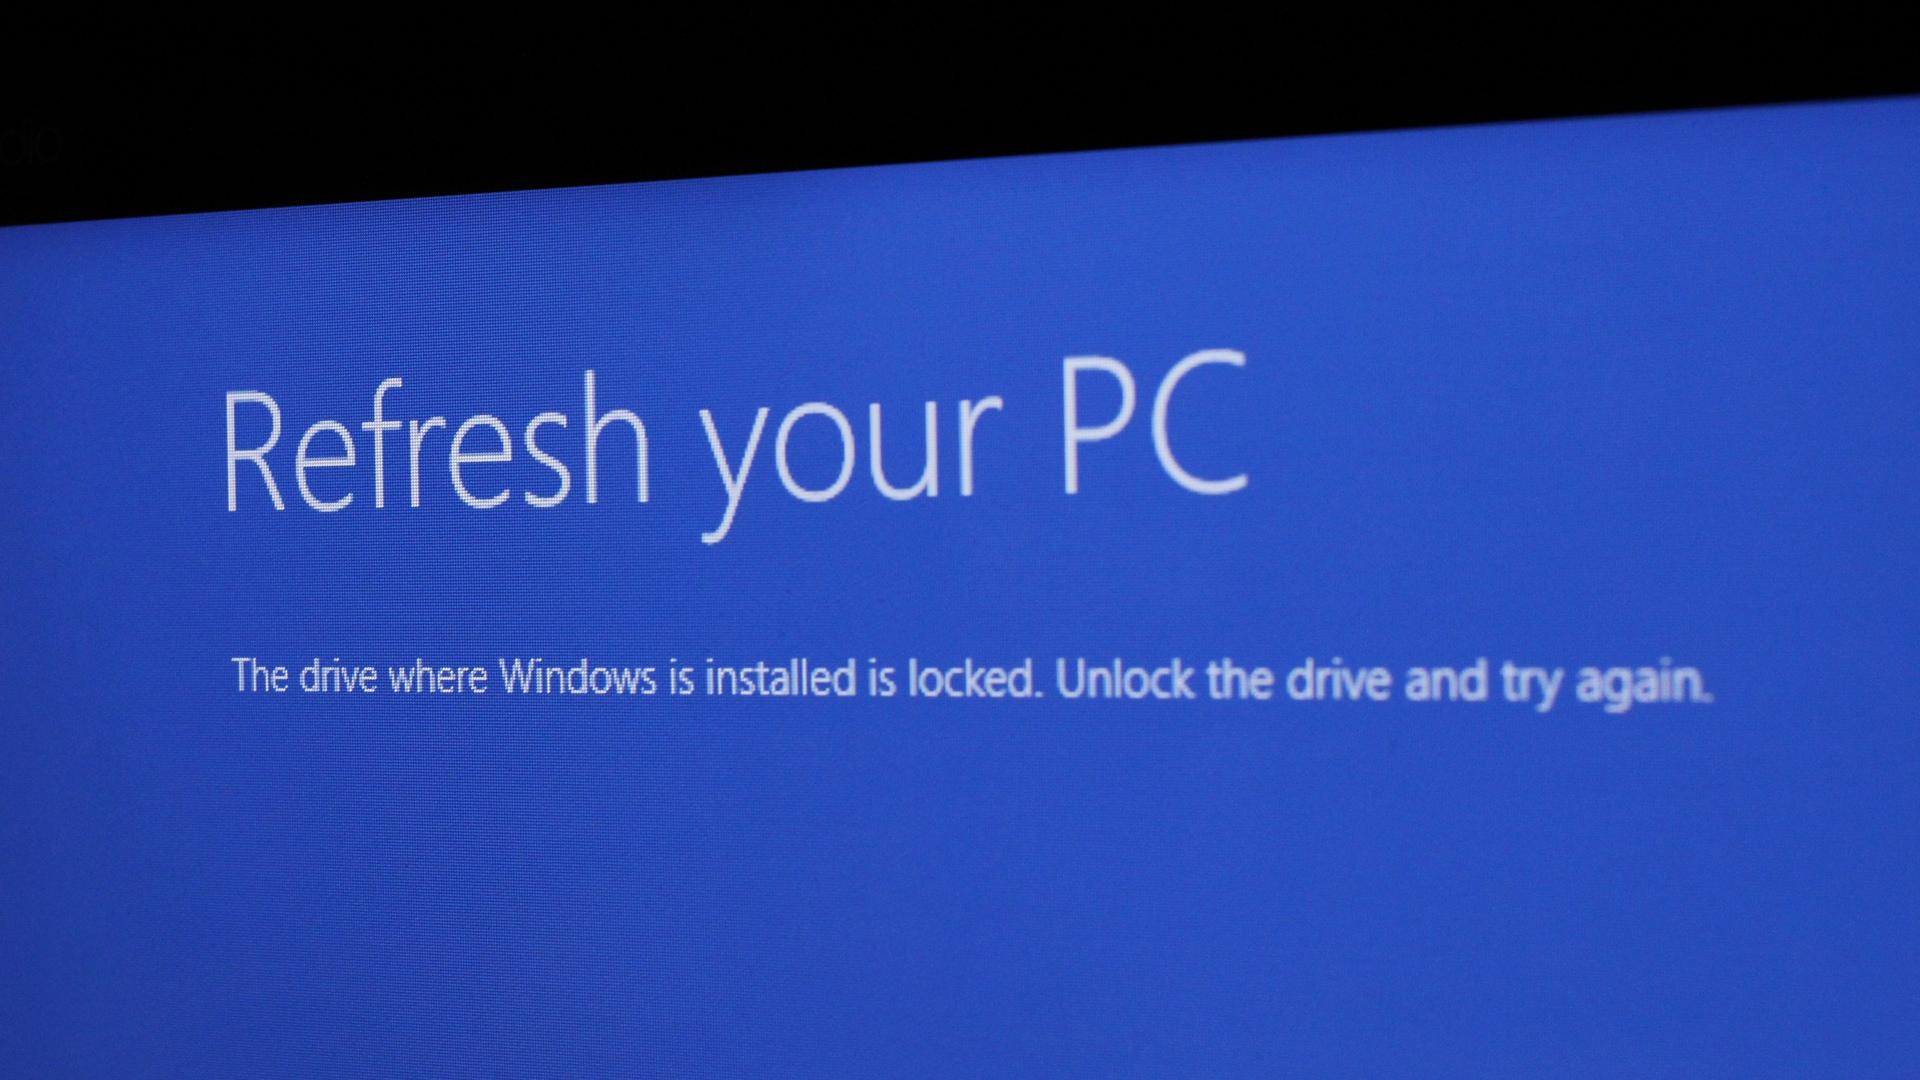 Windows 8.1 drive is locked